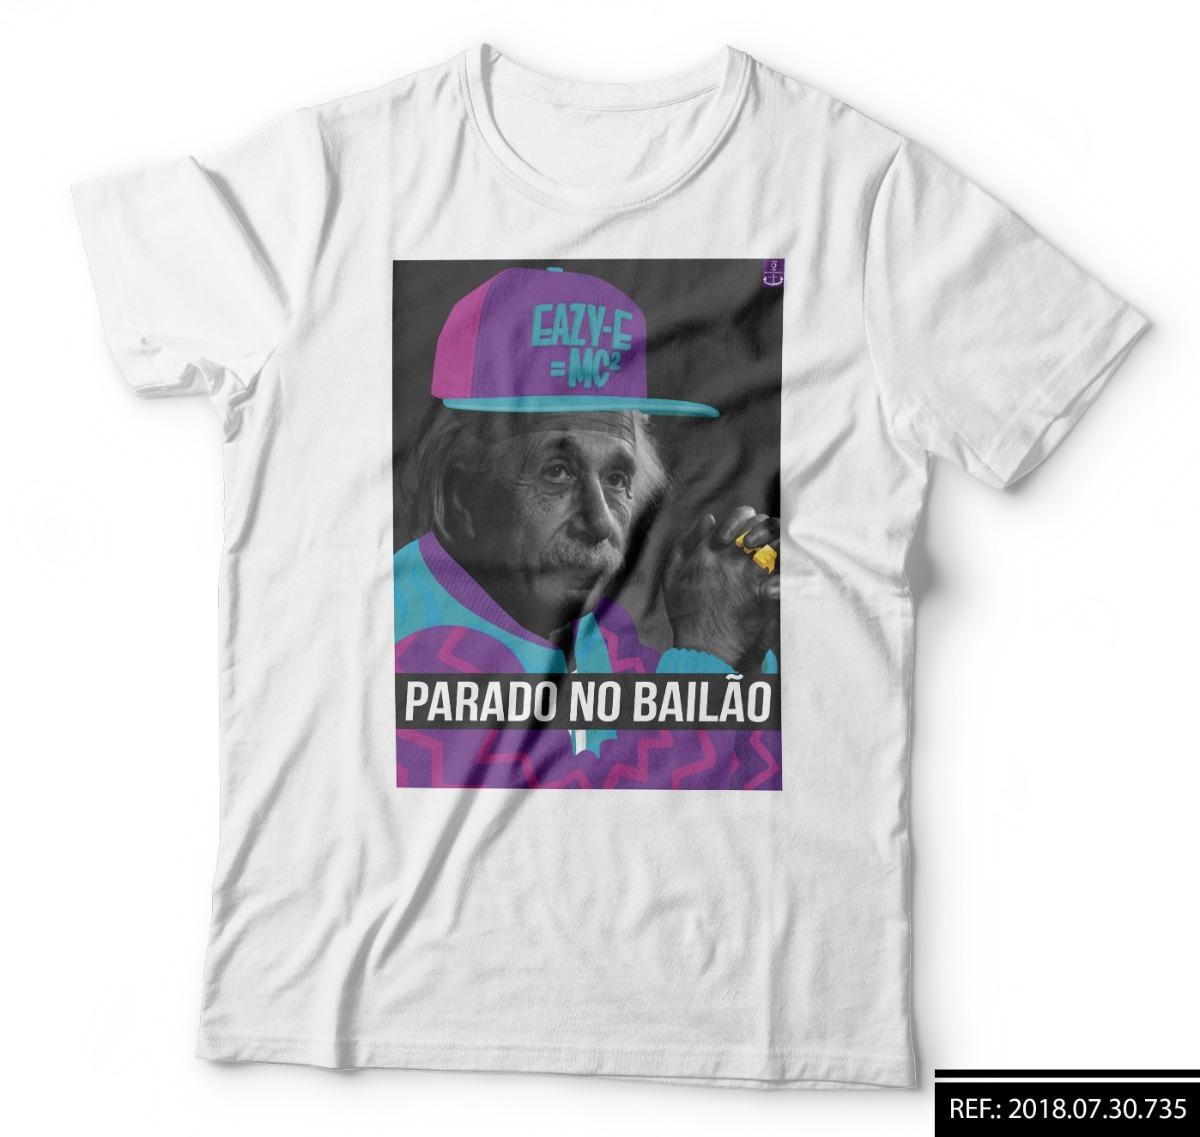 d57aa527f camisa camiseta parado no bailão funk albert einstein. Carregando zoom.